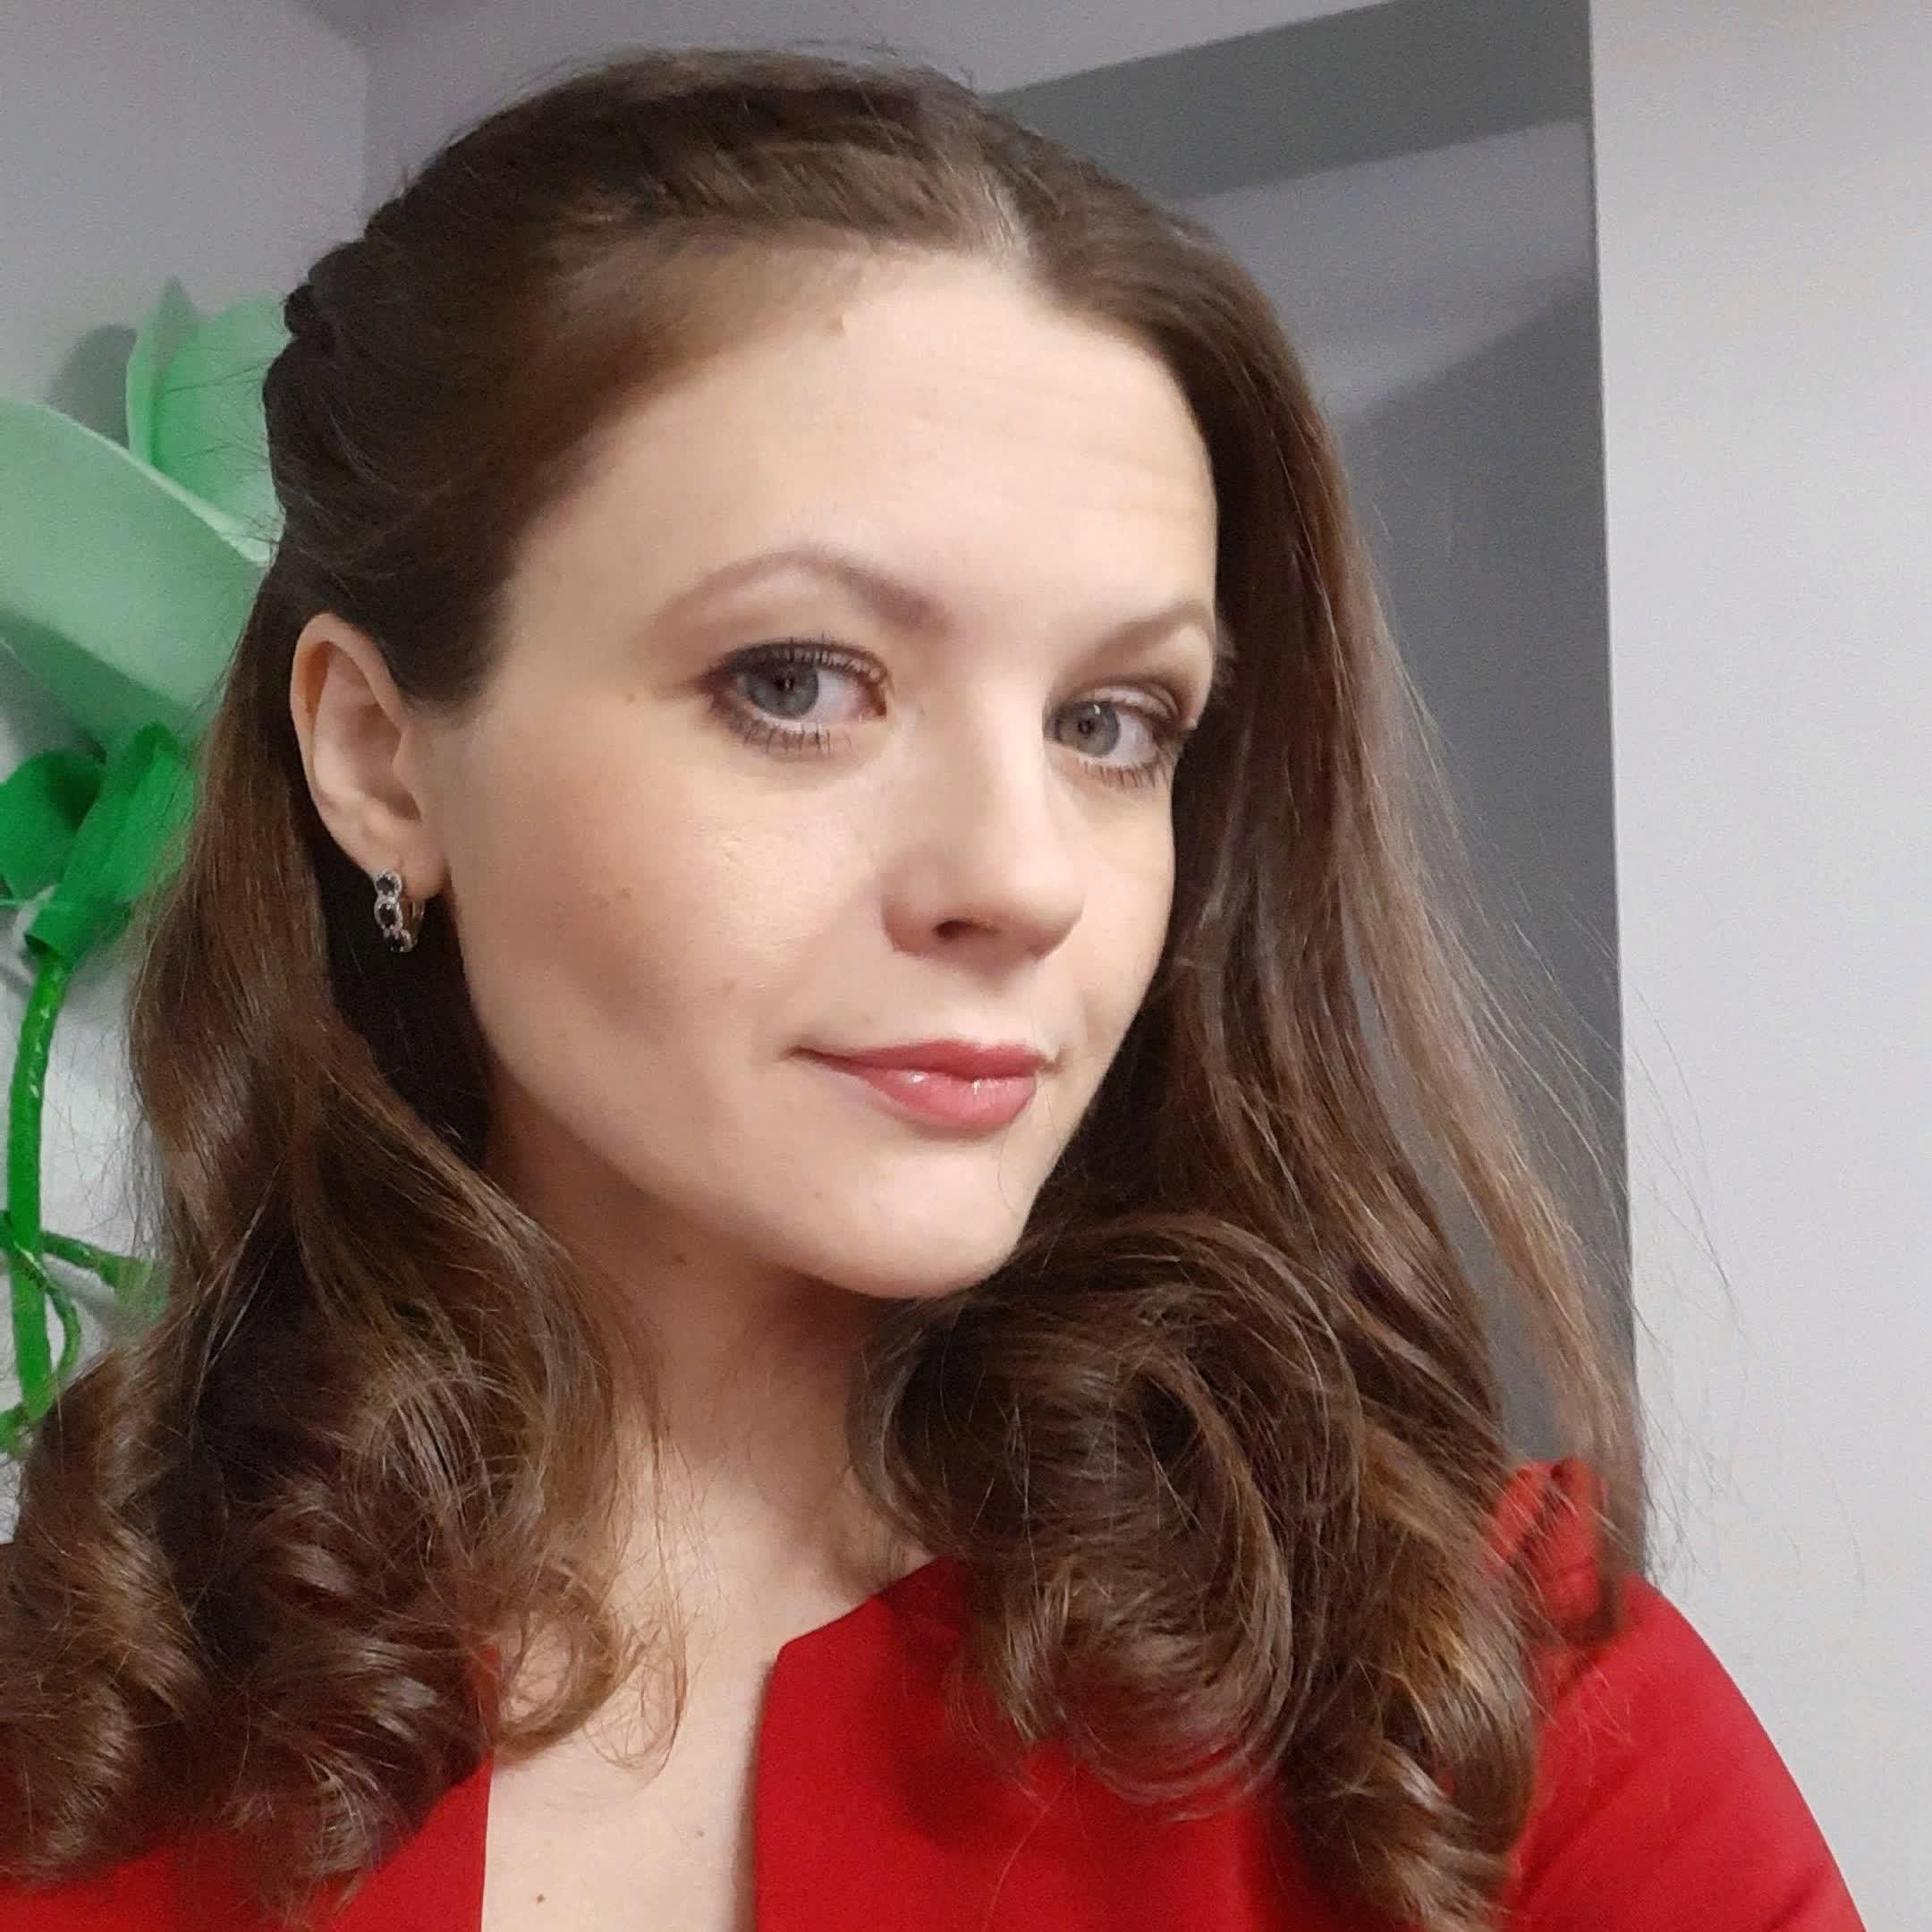 Наталья Шицкая. Фруктовая радость